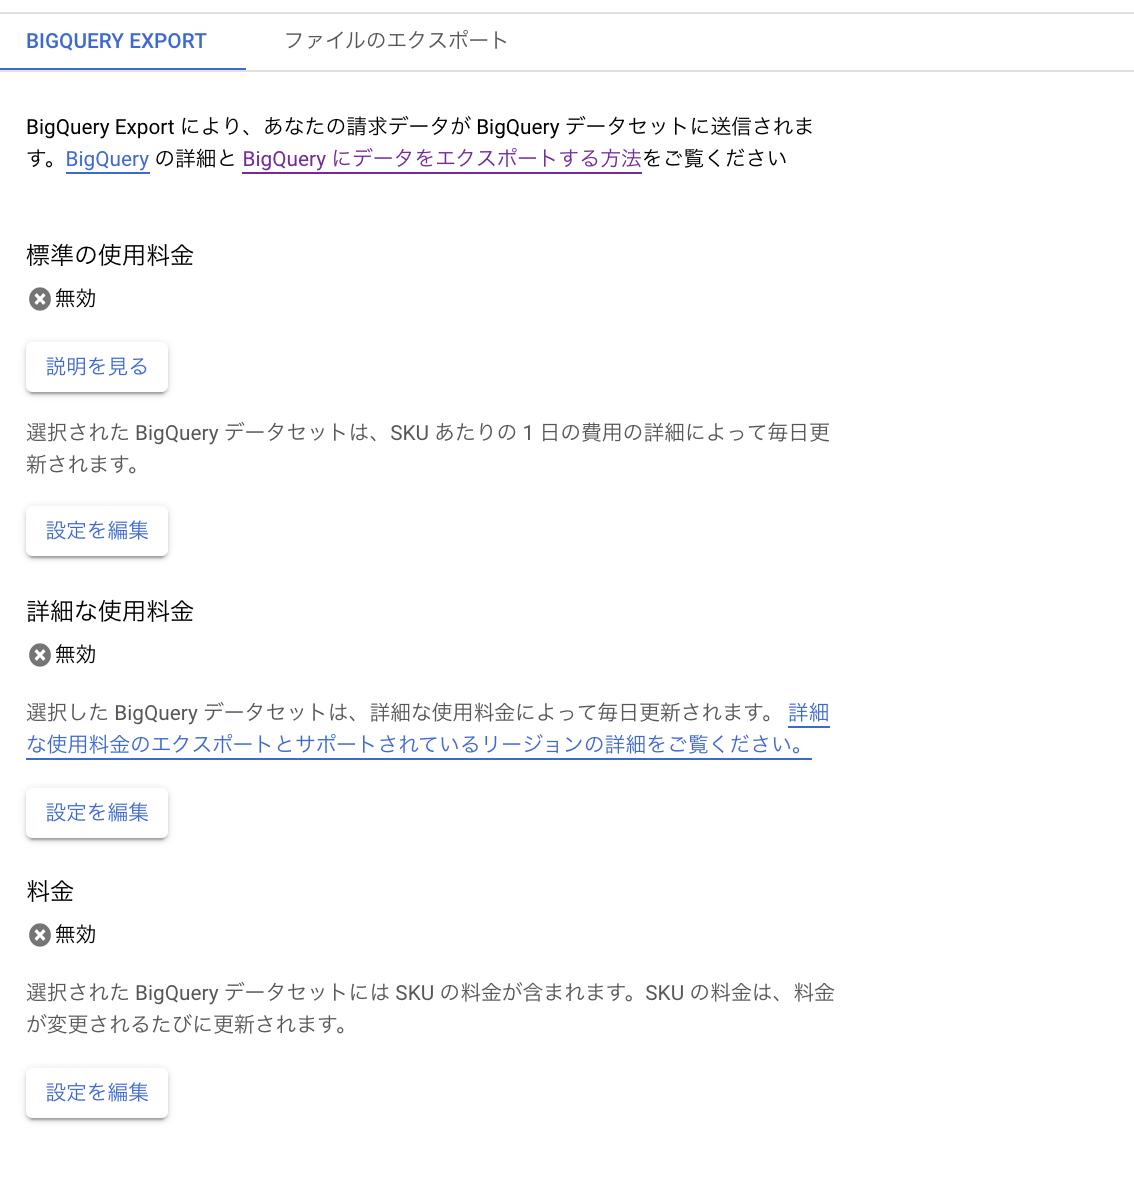 f:id:sadayoshi_tada:20210906190210p:plain